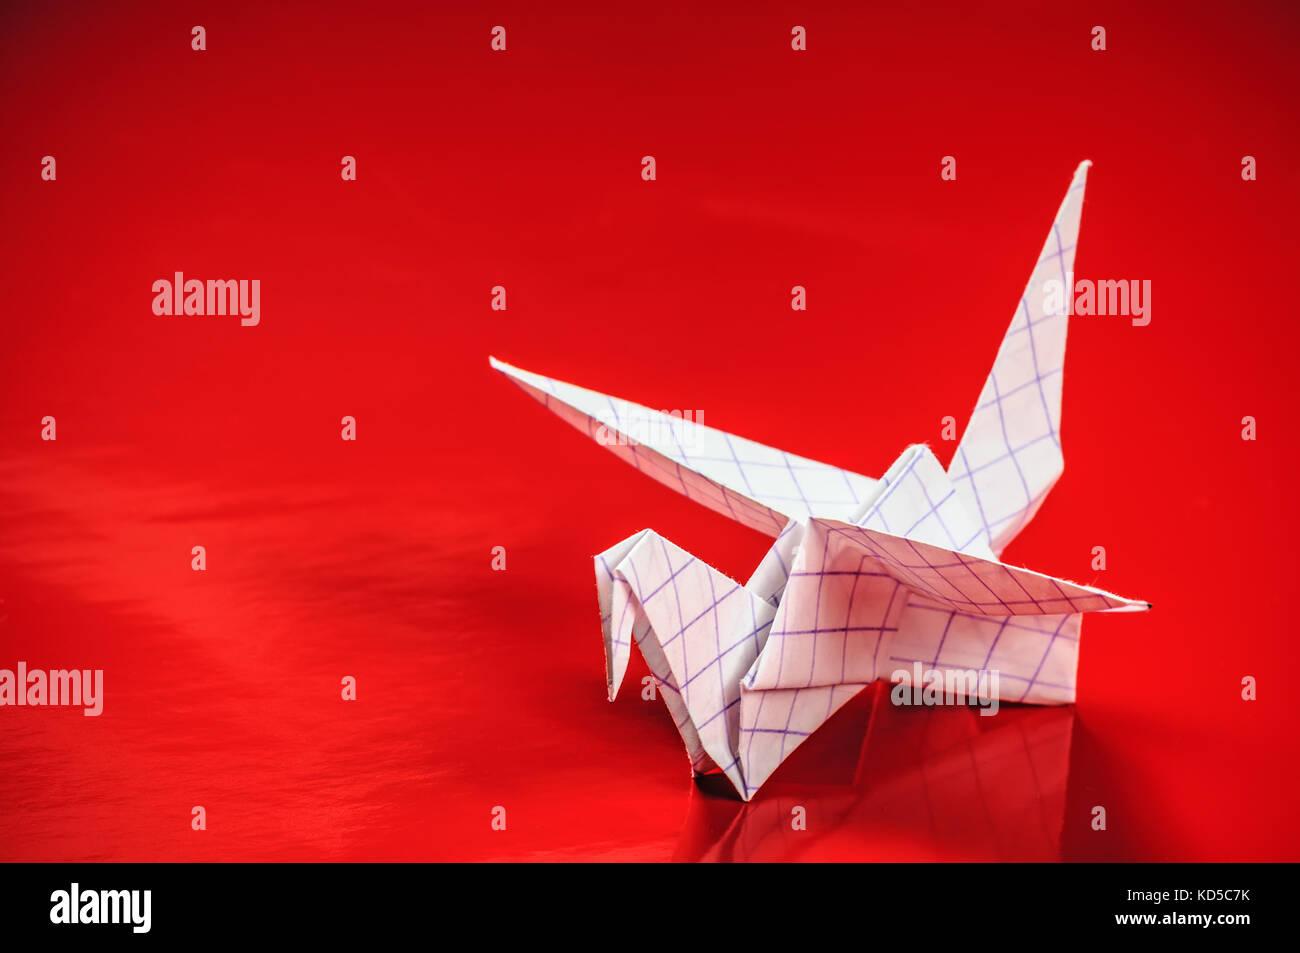 Origami-Kranich auf rotem Grund Stockbild